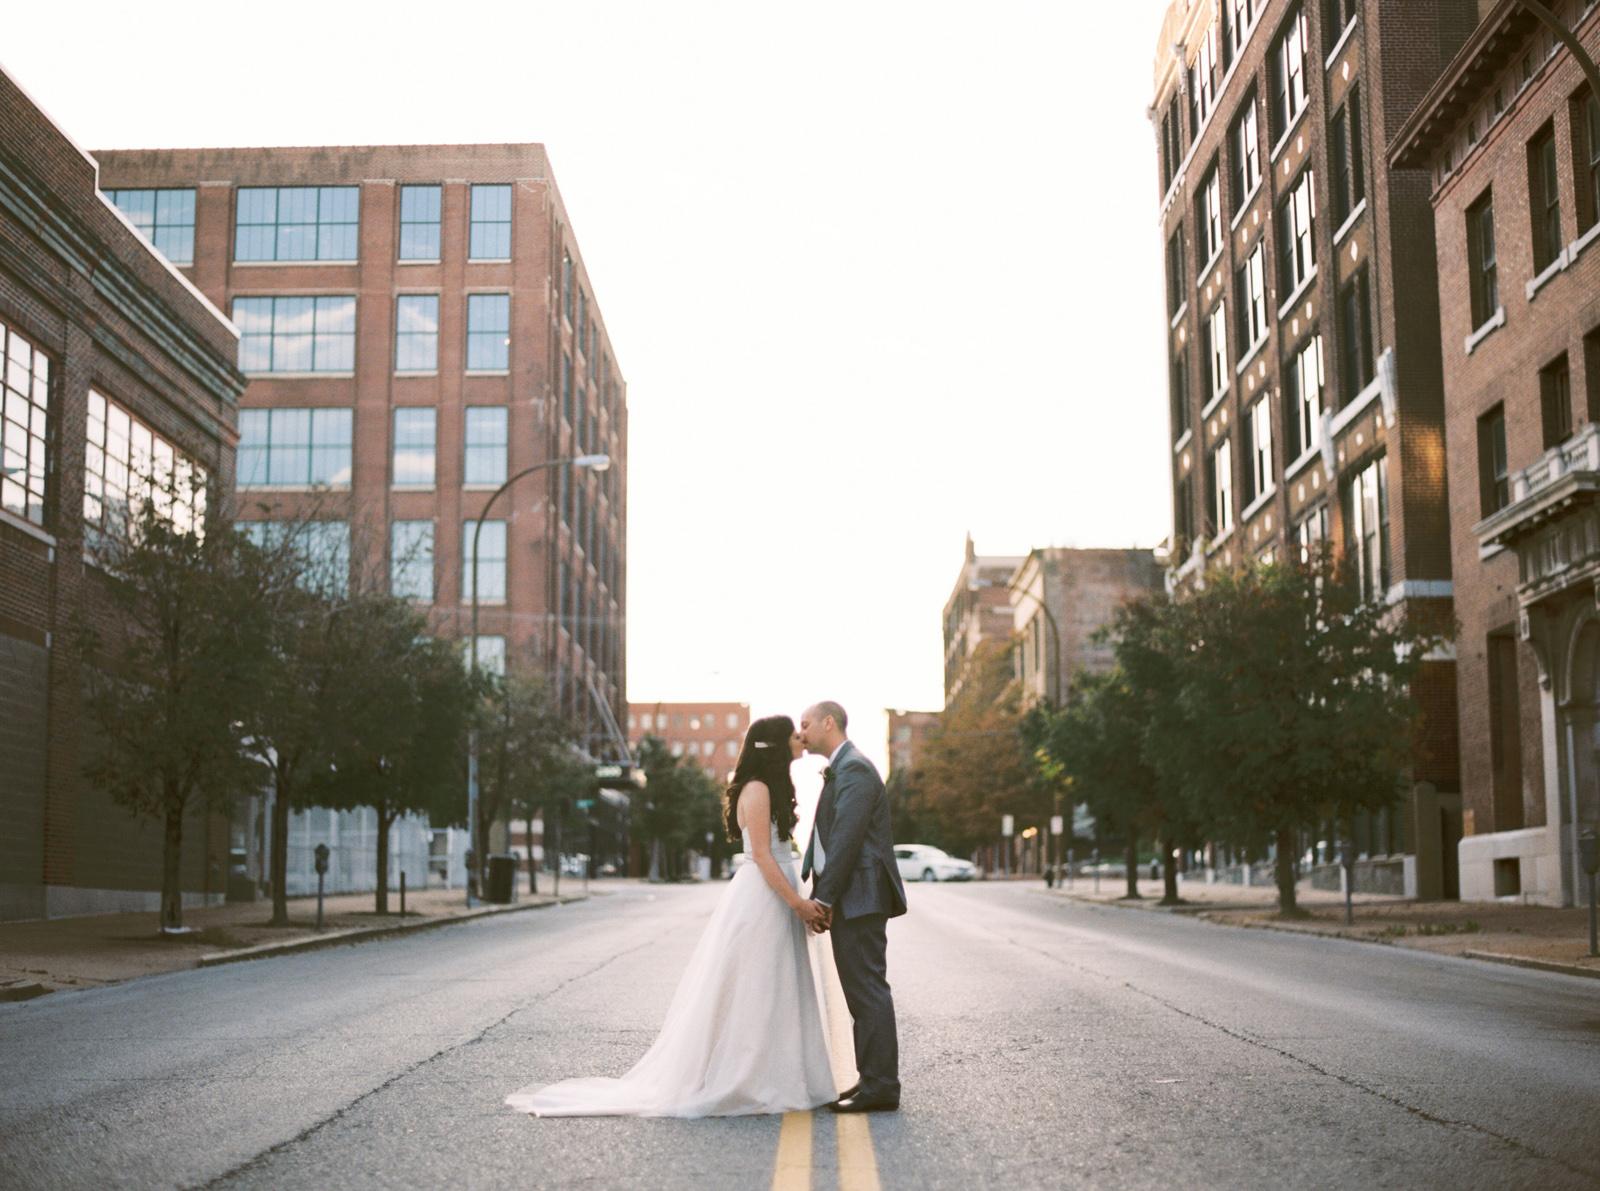 Oldani-Photography-St-Louis-Film-Photographer-Schlafly-Tap-Room-Wedding-Reception8603_12.jpg